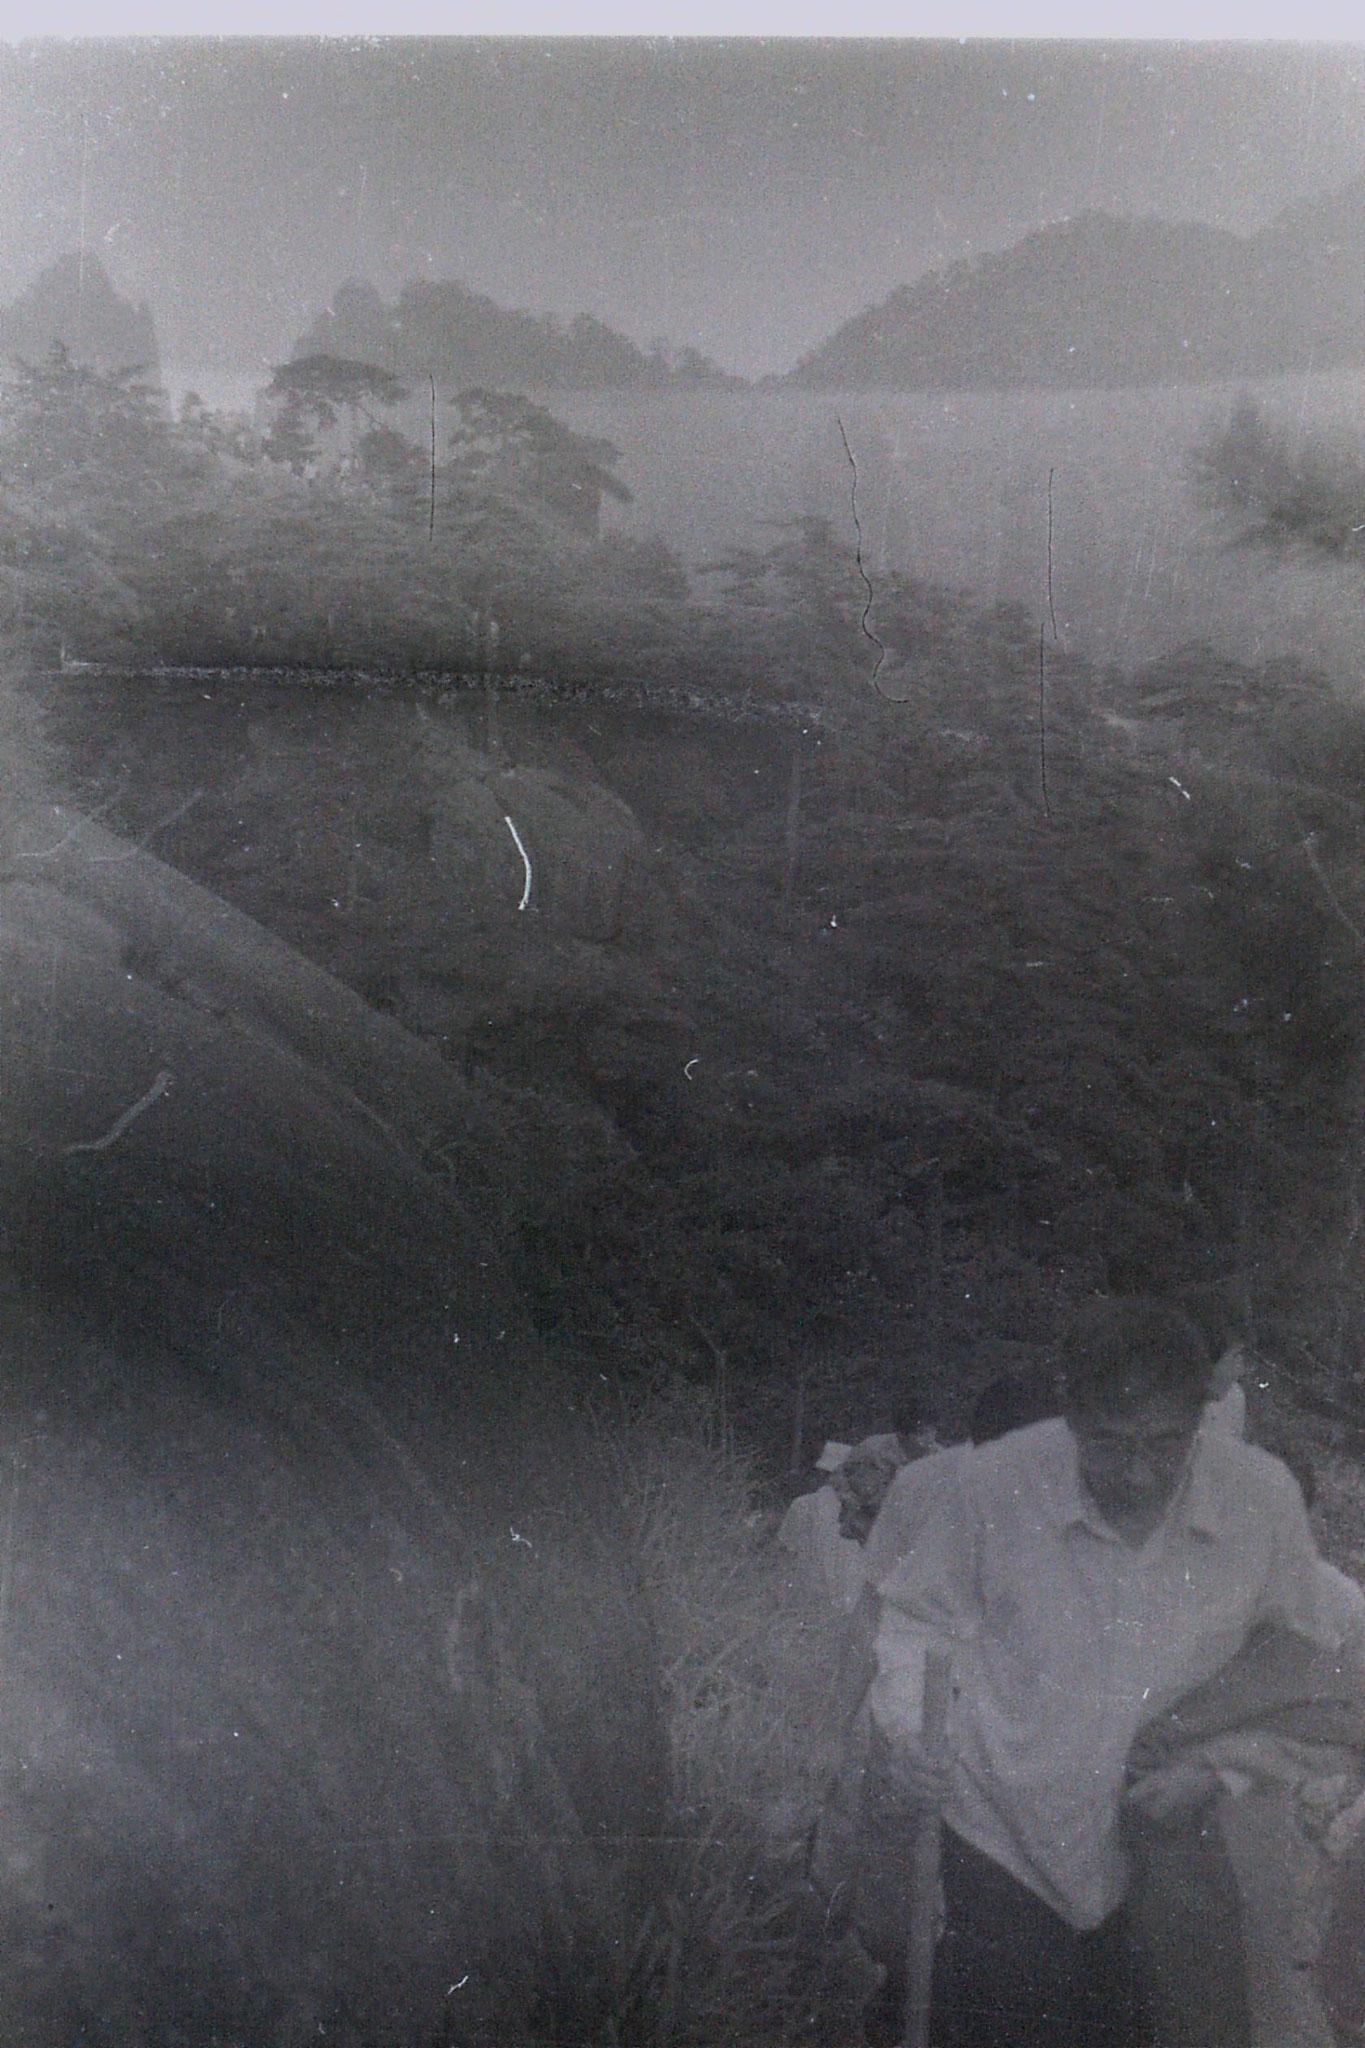 3/8/1989: 13: Huang Shan nr Beilai Hotel